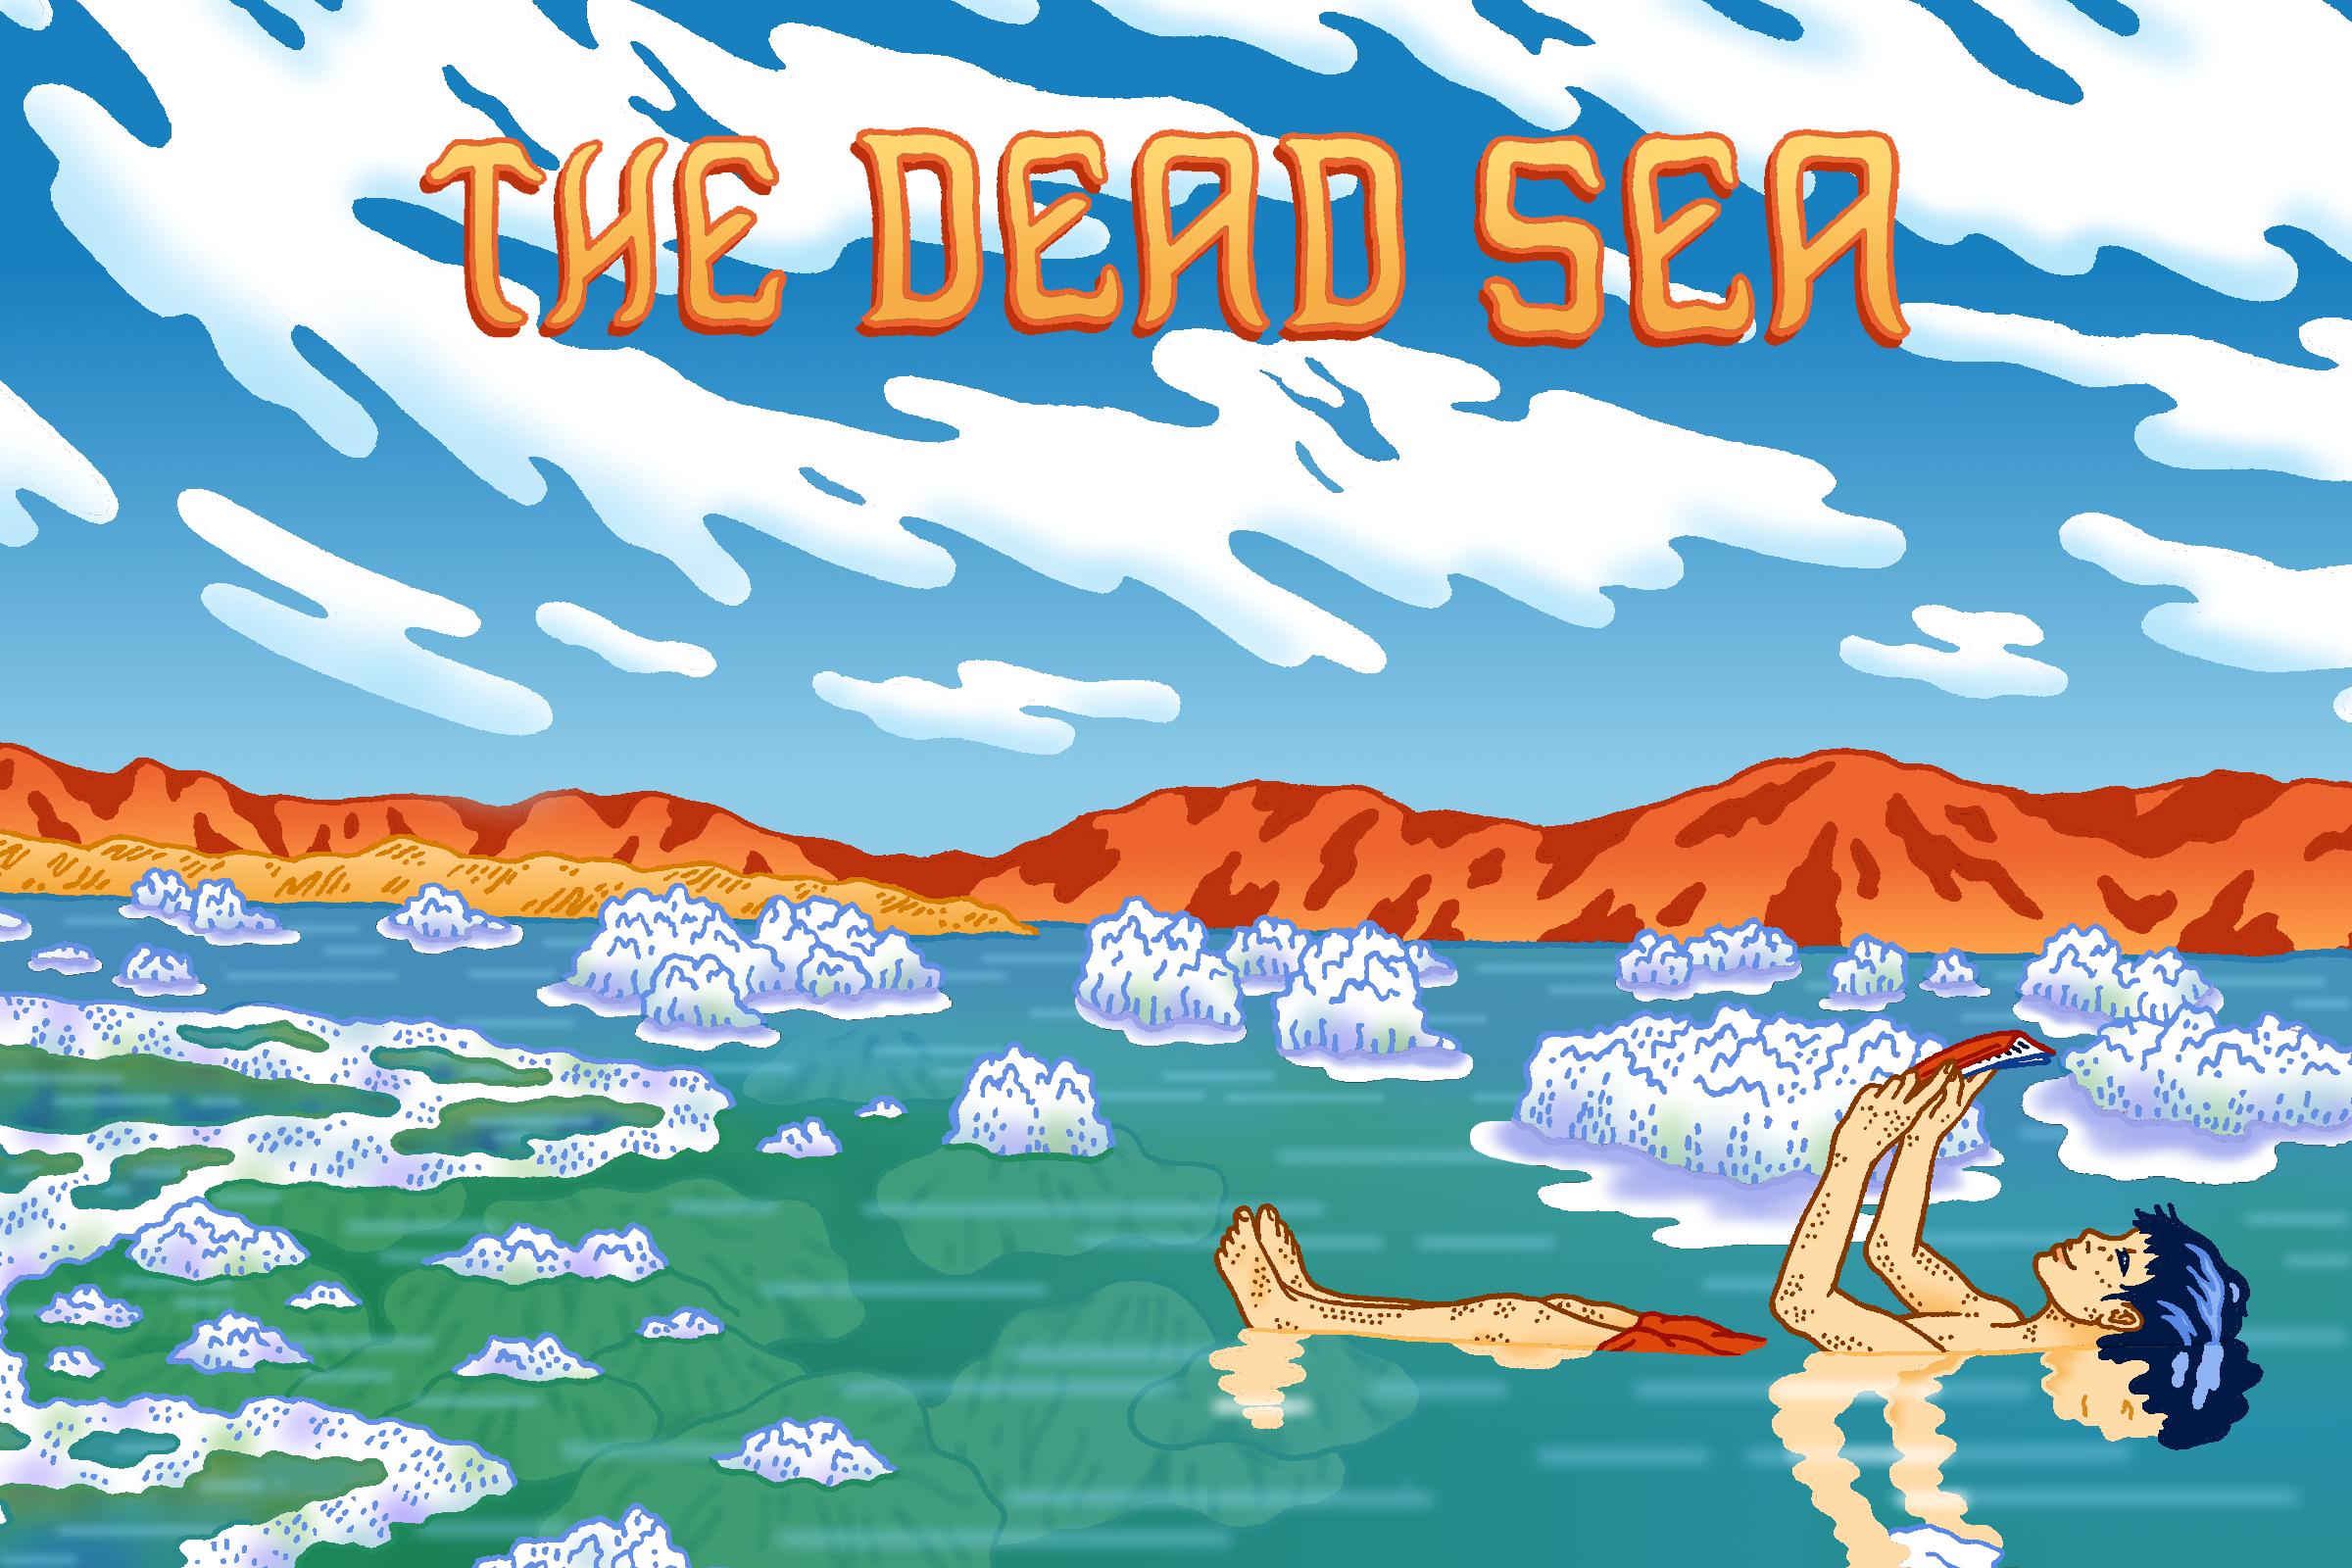 The Dead Sea Final Color.jpg